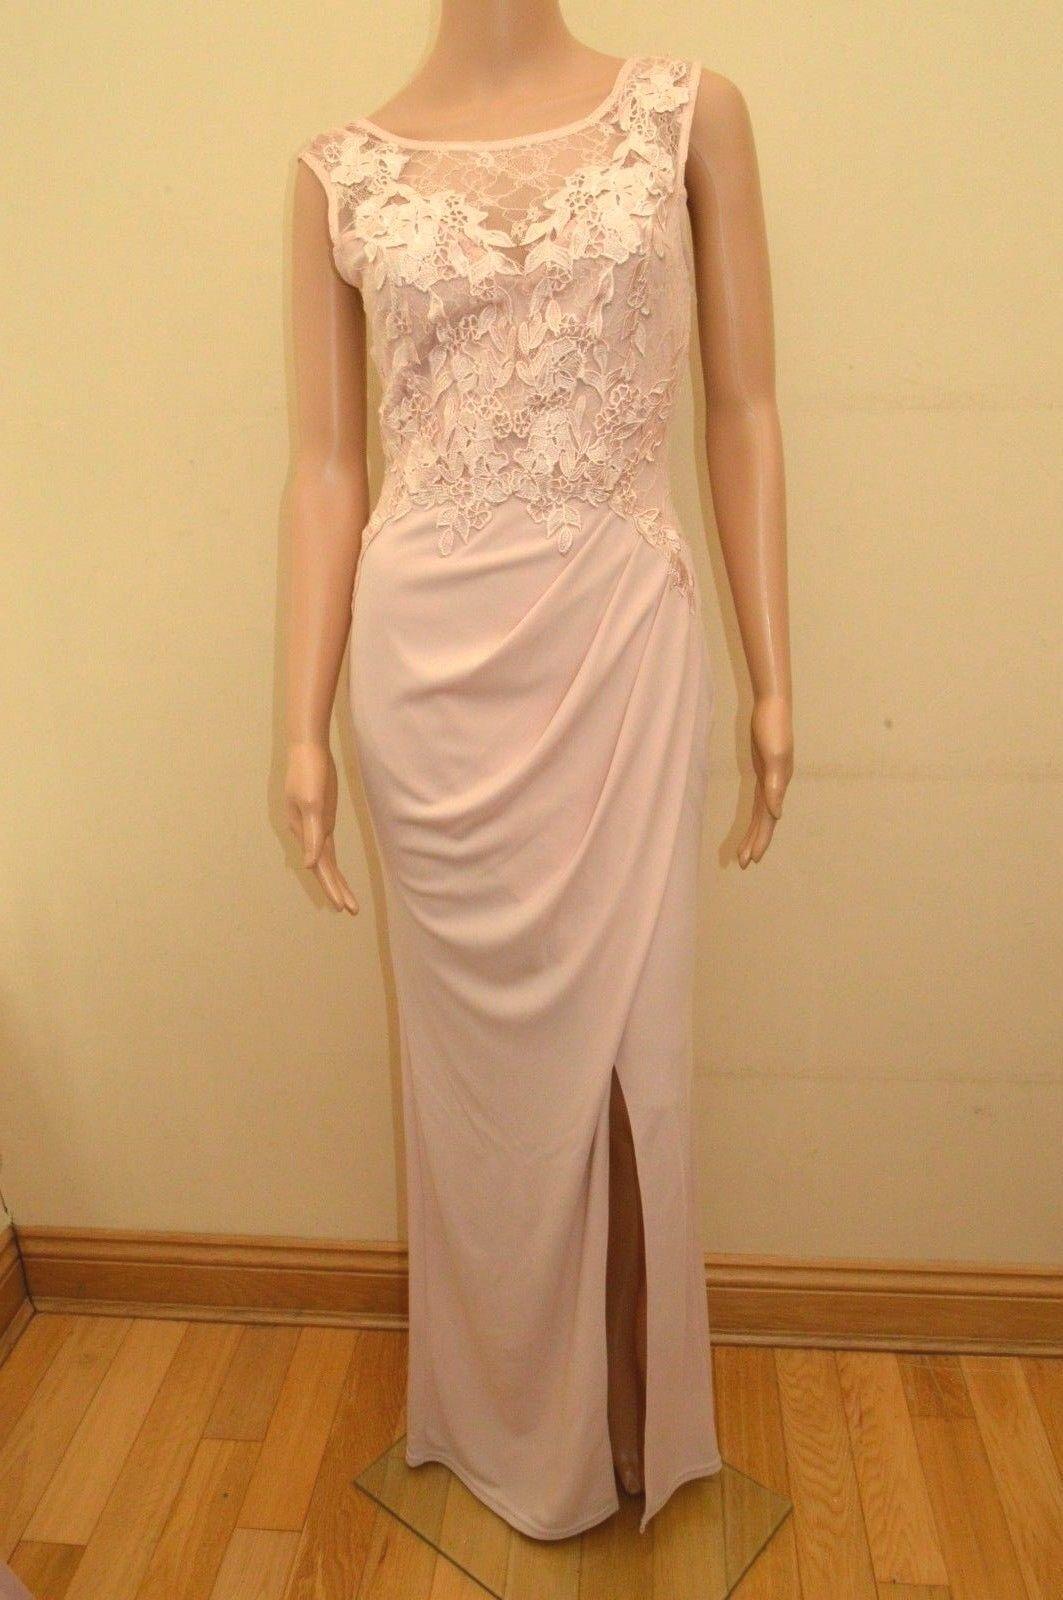 New Lipsy Petite Michelle Keegan Nude Applique Lace Maxi Dress Sz UK 12